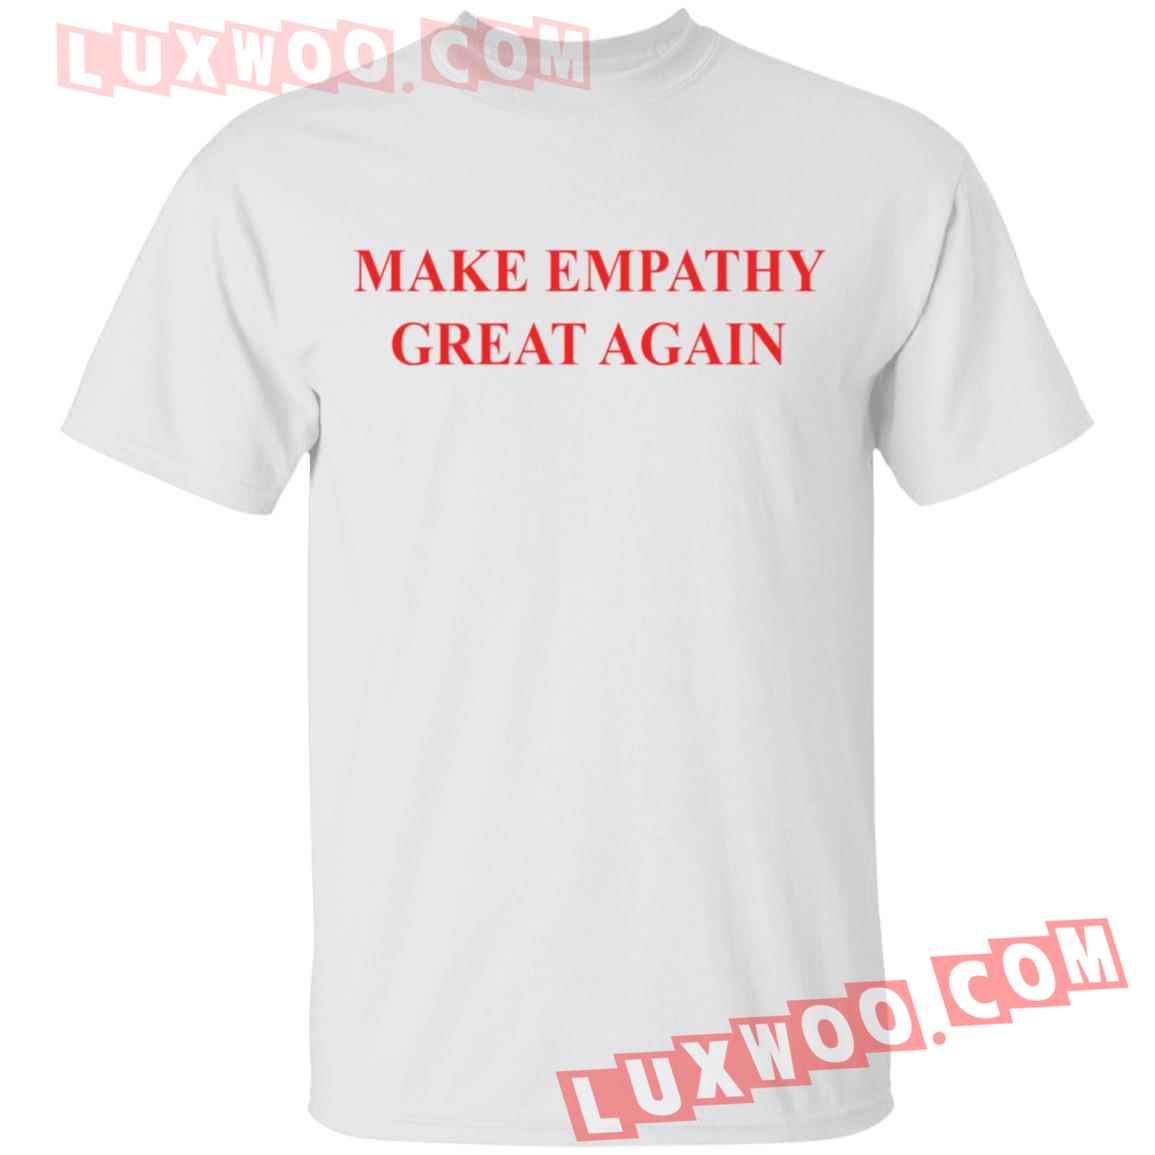 Make Empathy Great Again Shirt